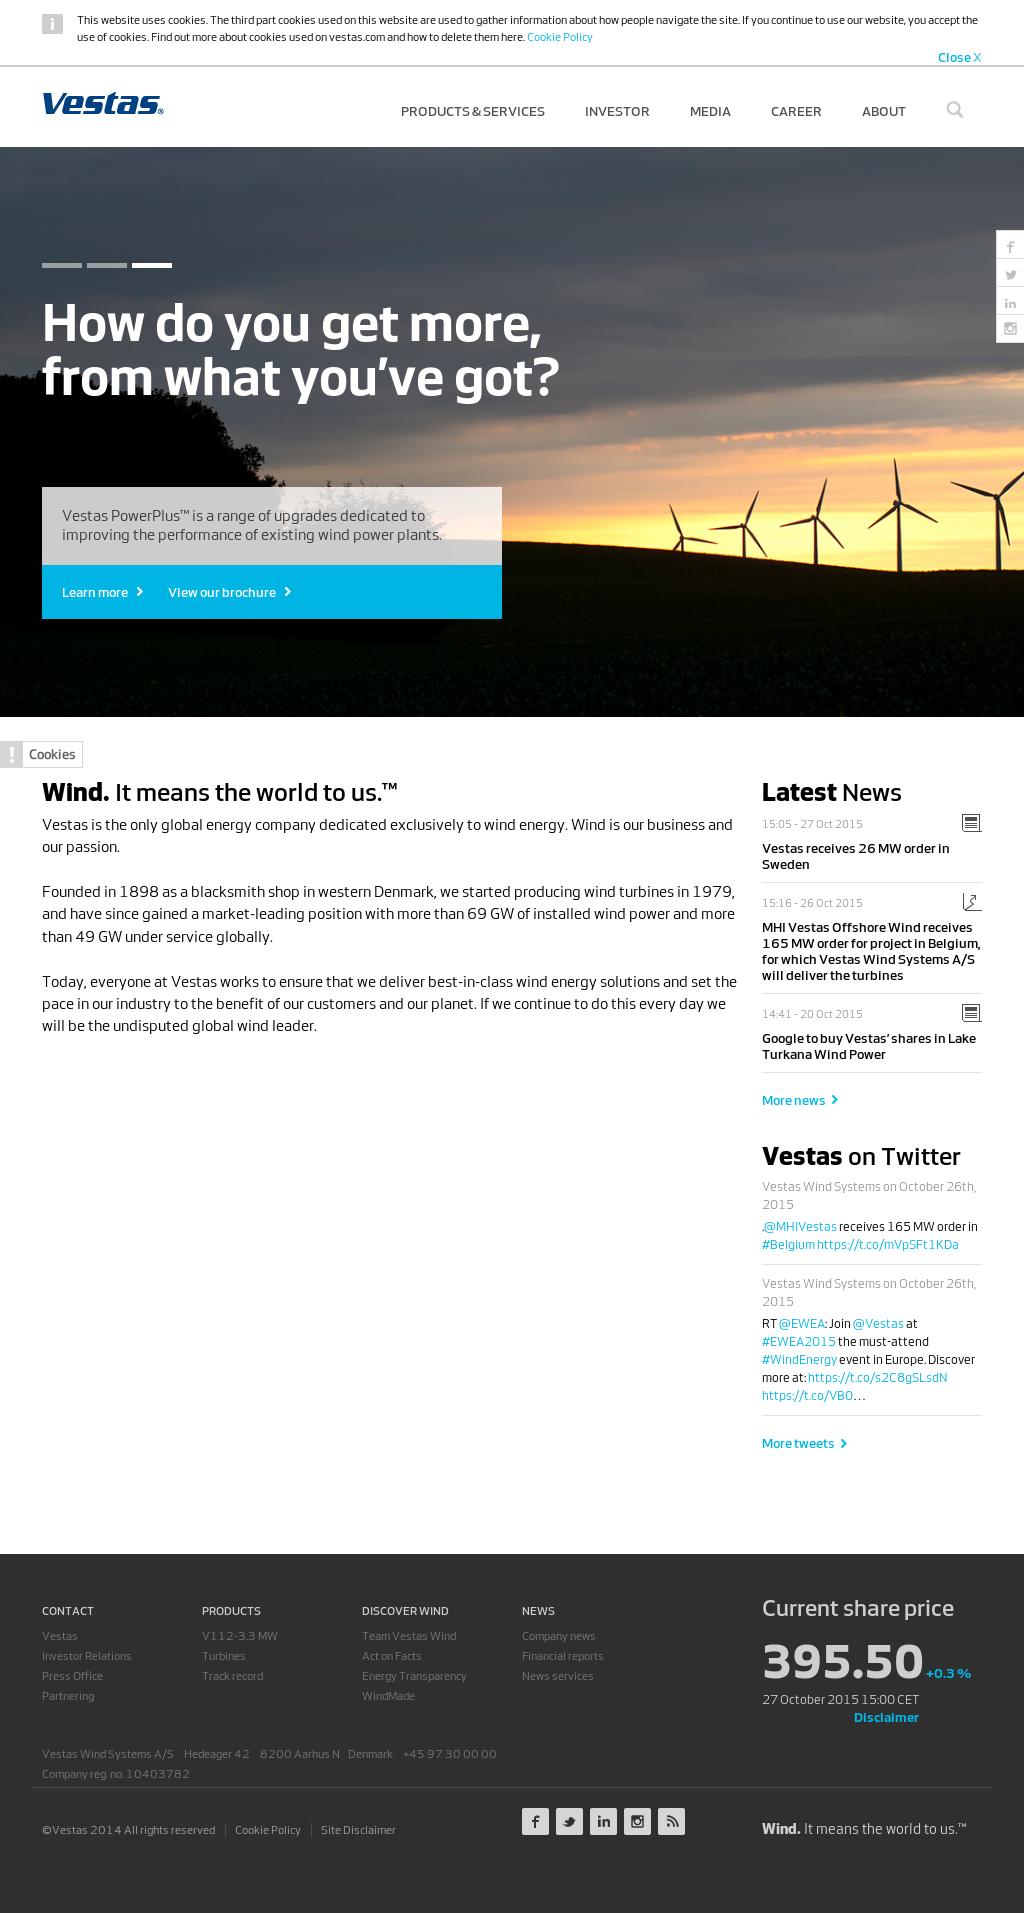 Vestas Competitors, Revenue and Employees - Owler Company Profile